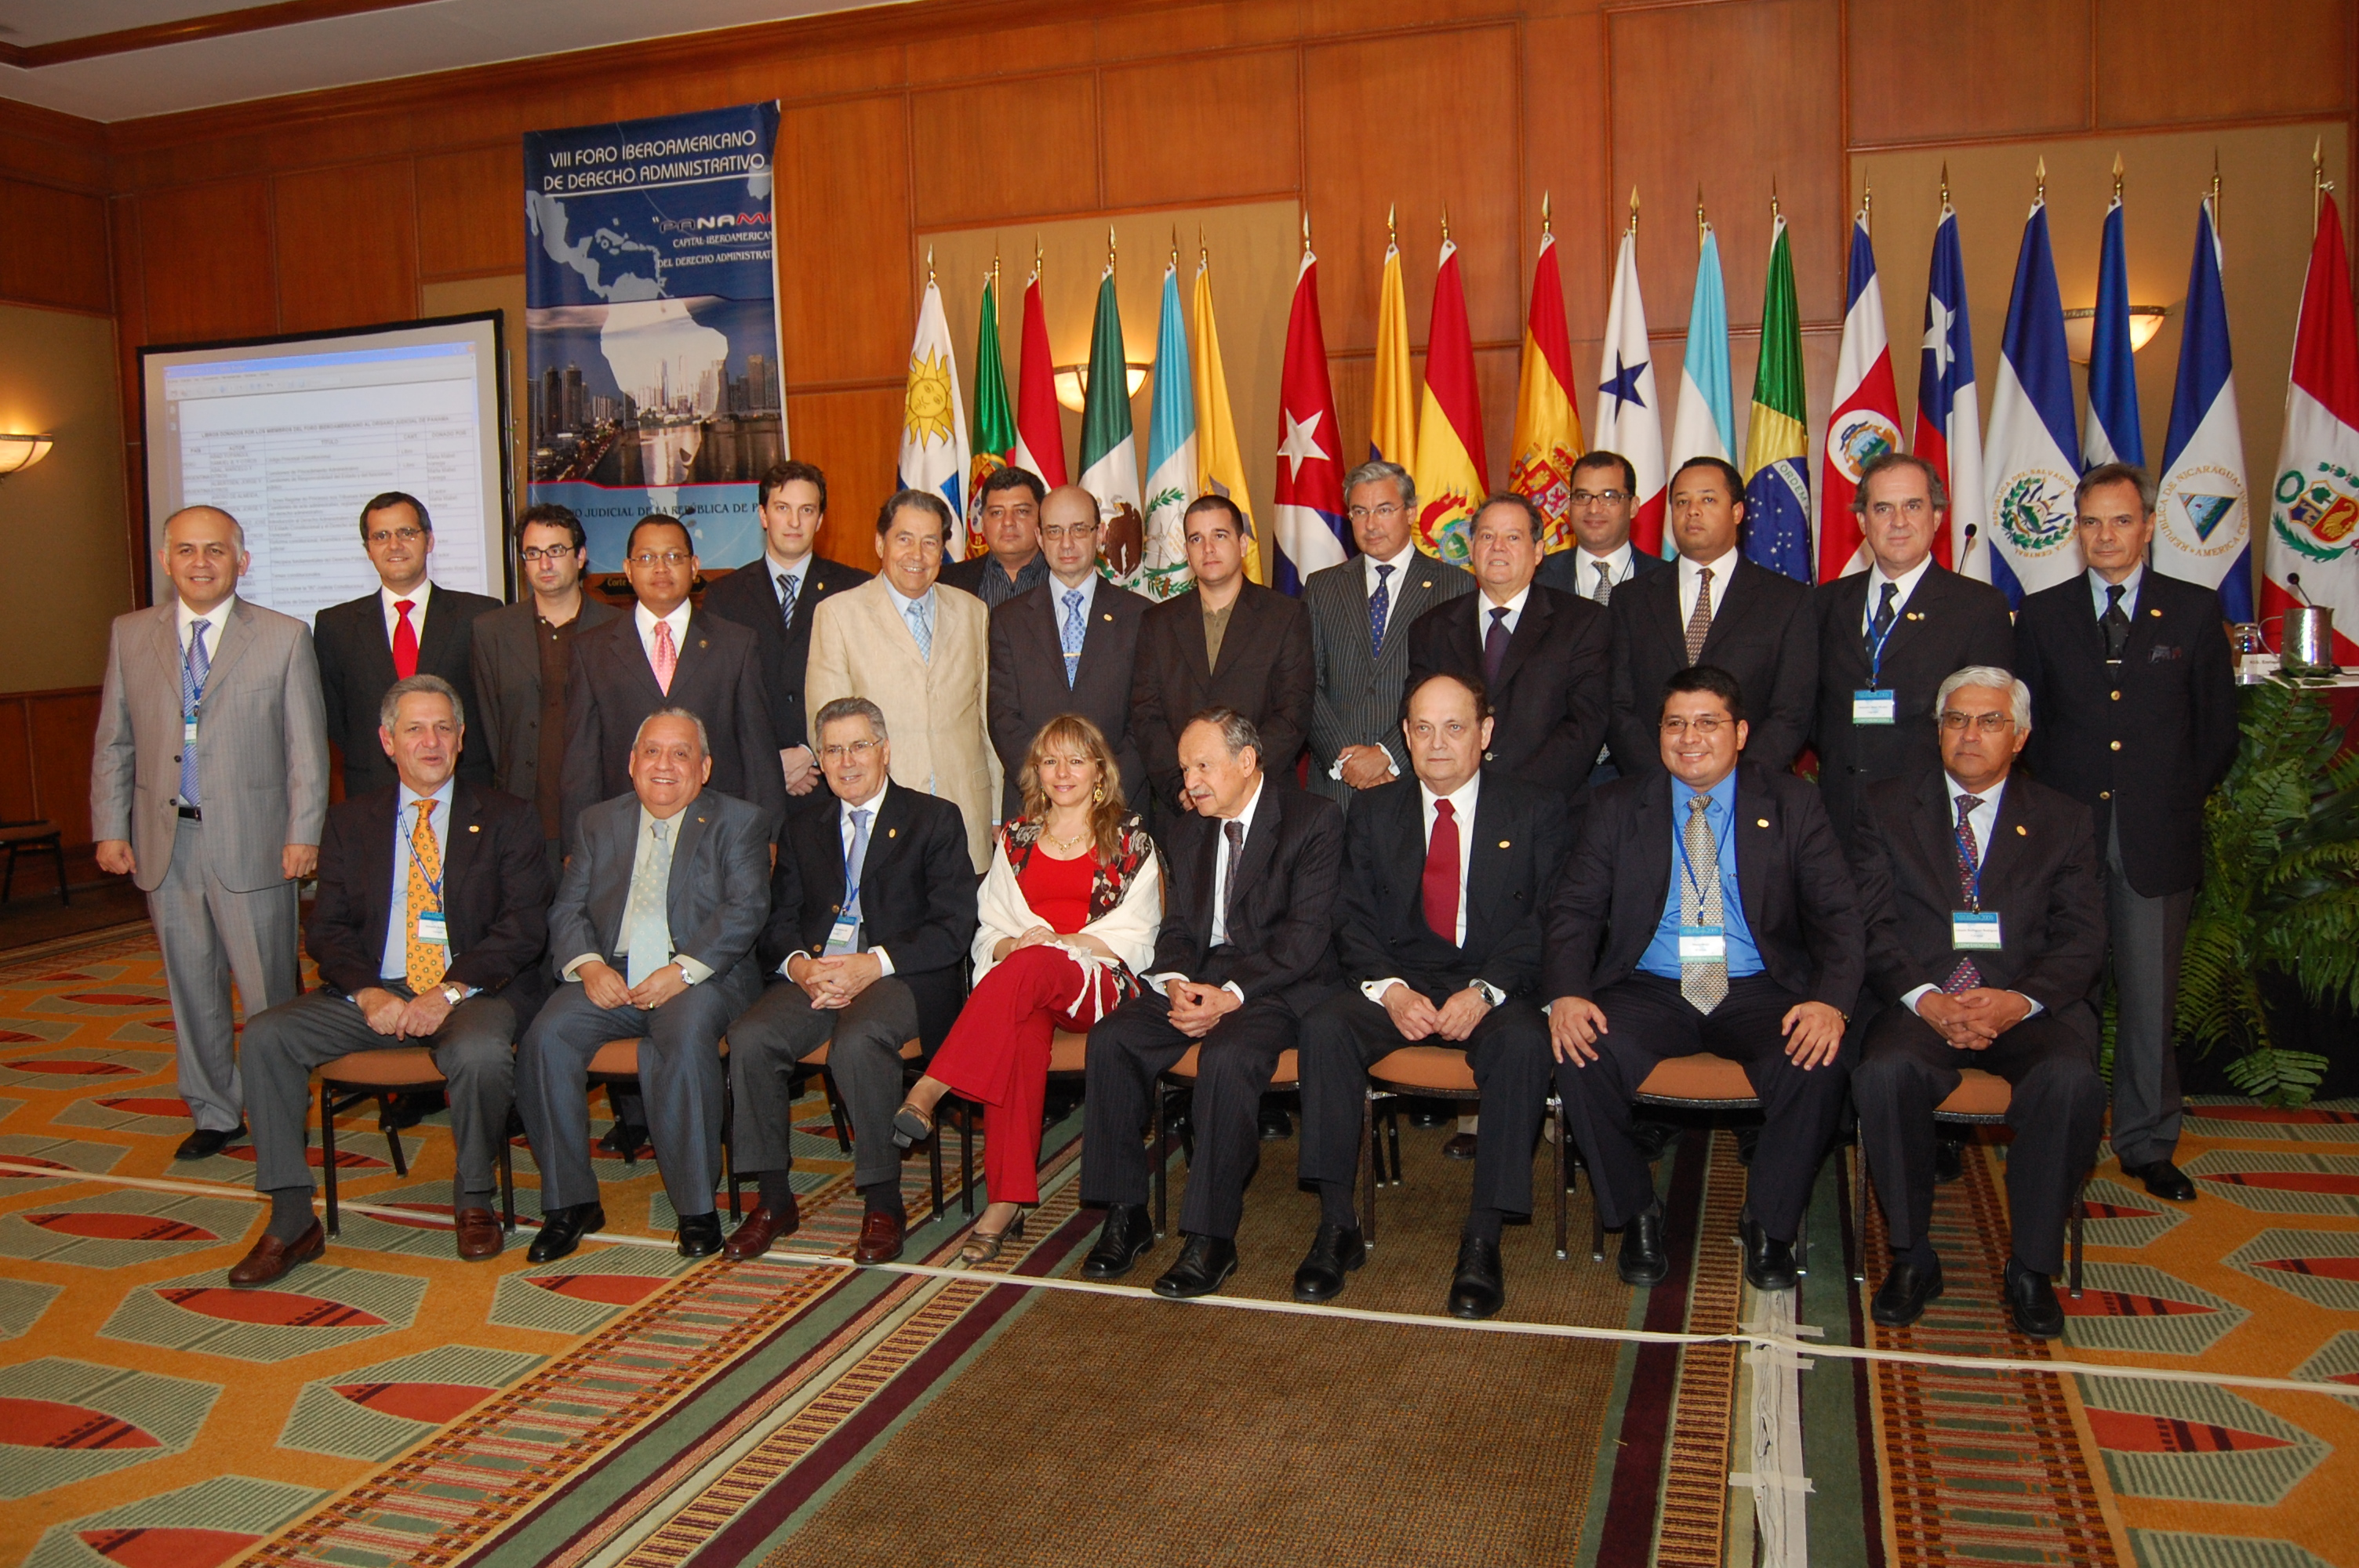 VIII Foro Iberoamericano de Derecho Administrativo Iberoamericano: 18 de Septiembre de 2009 en Panamá (Panamá)